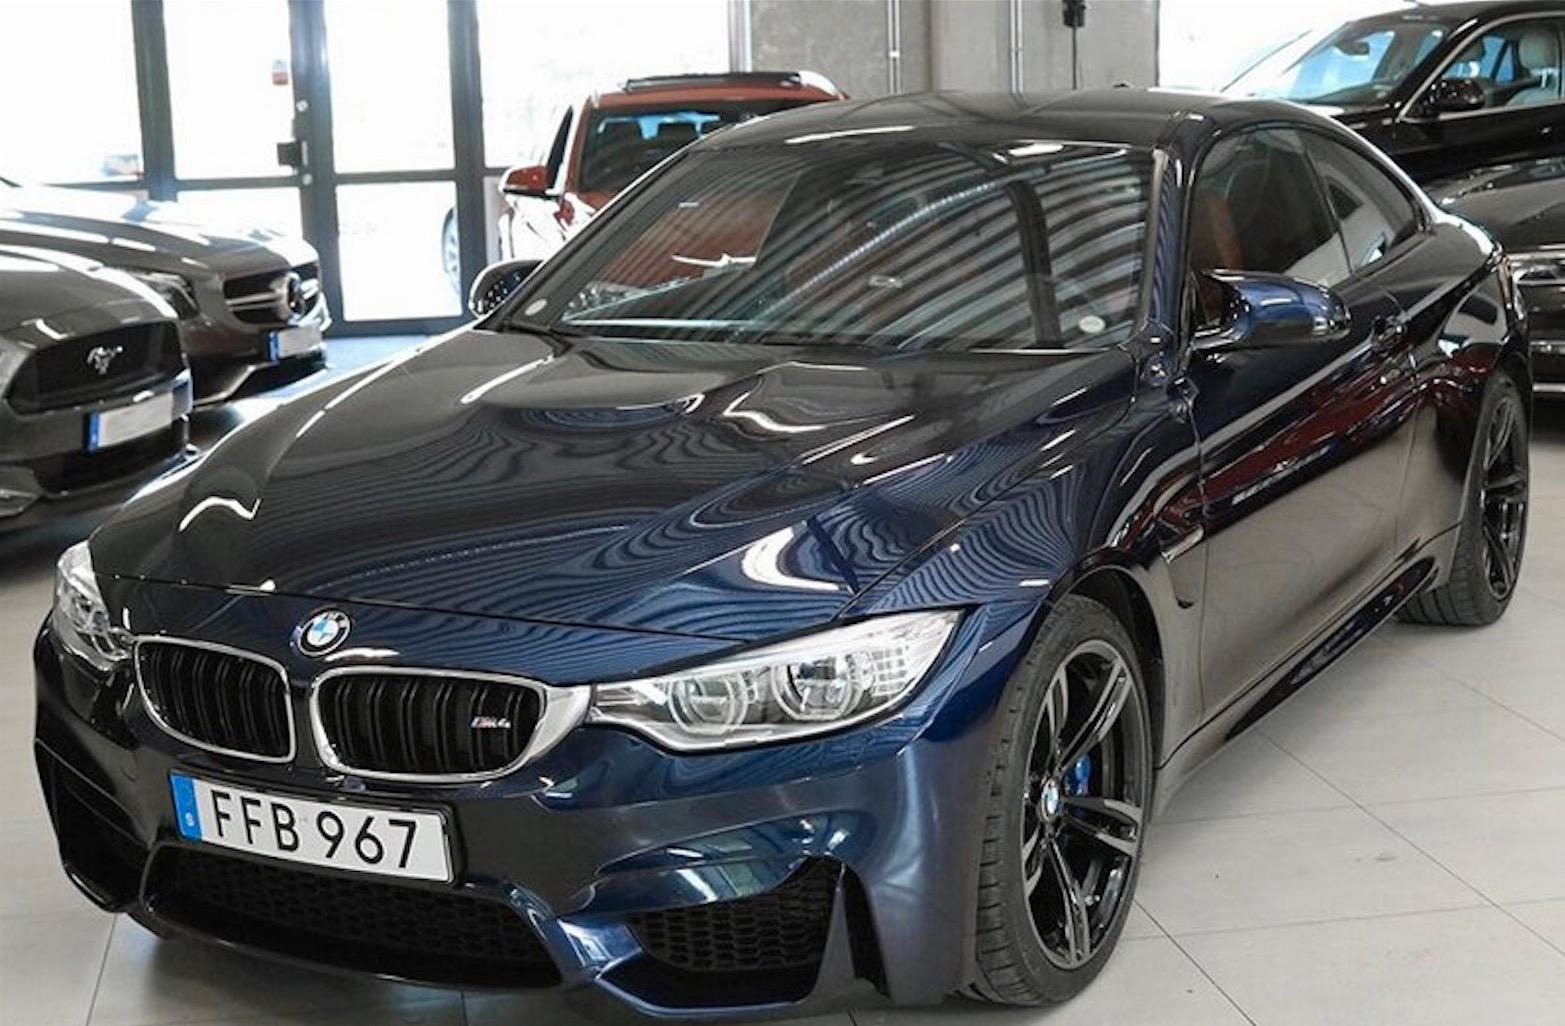 Denna BMW M4 coupé DCT stals i Almvik och är efterlyst.